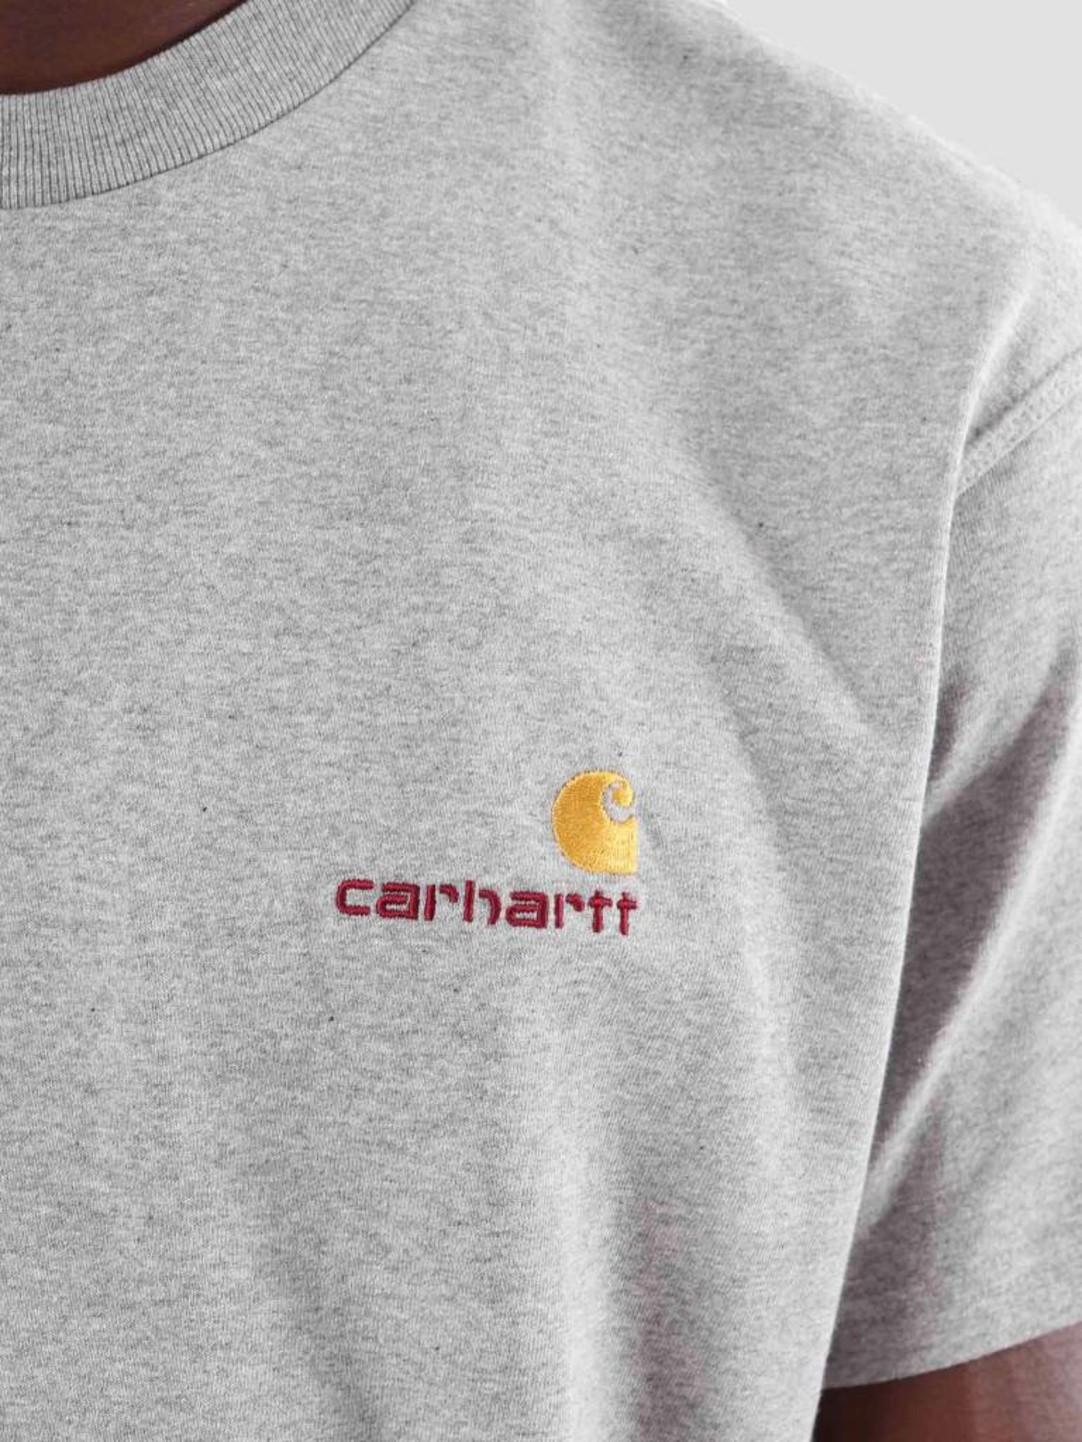 Carhartt WIP Carhartt WIP American Script T-Shirt Grey Heather I025711-V600